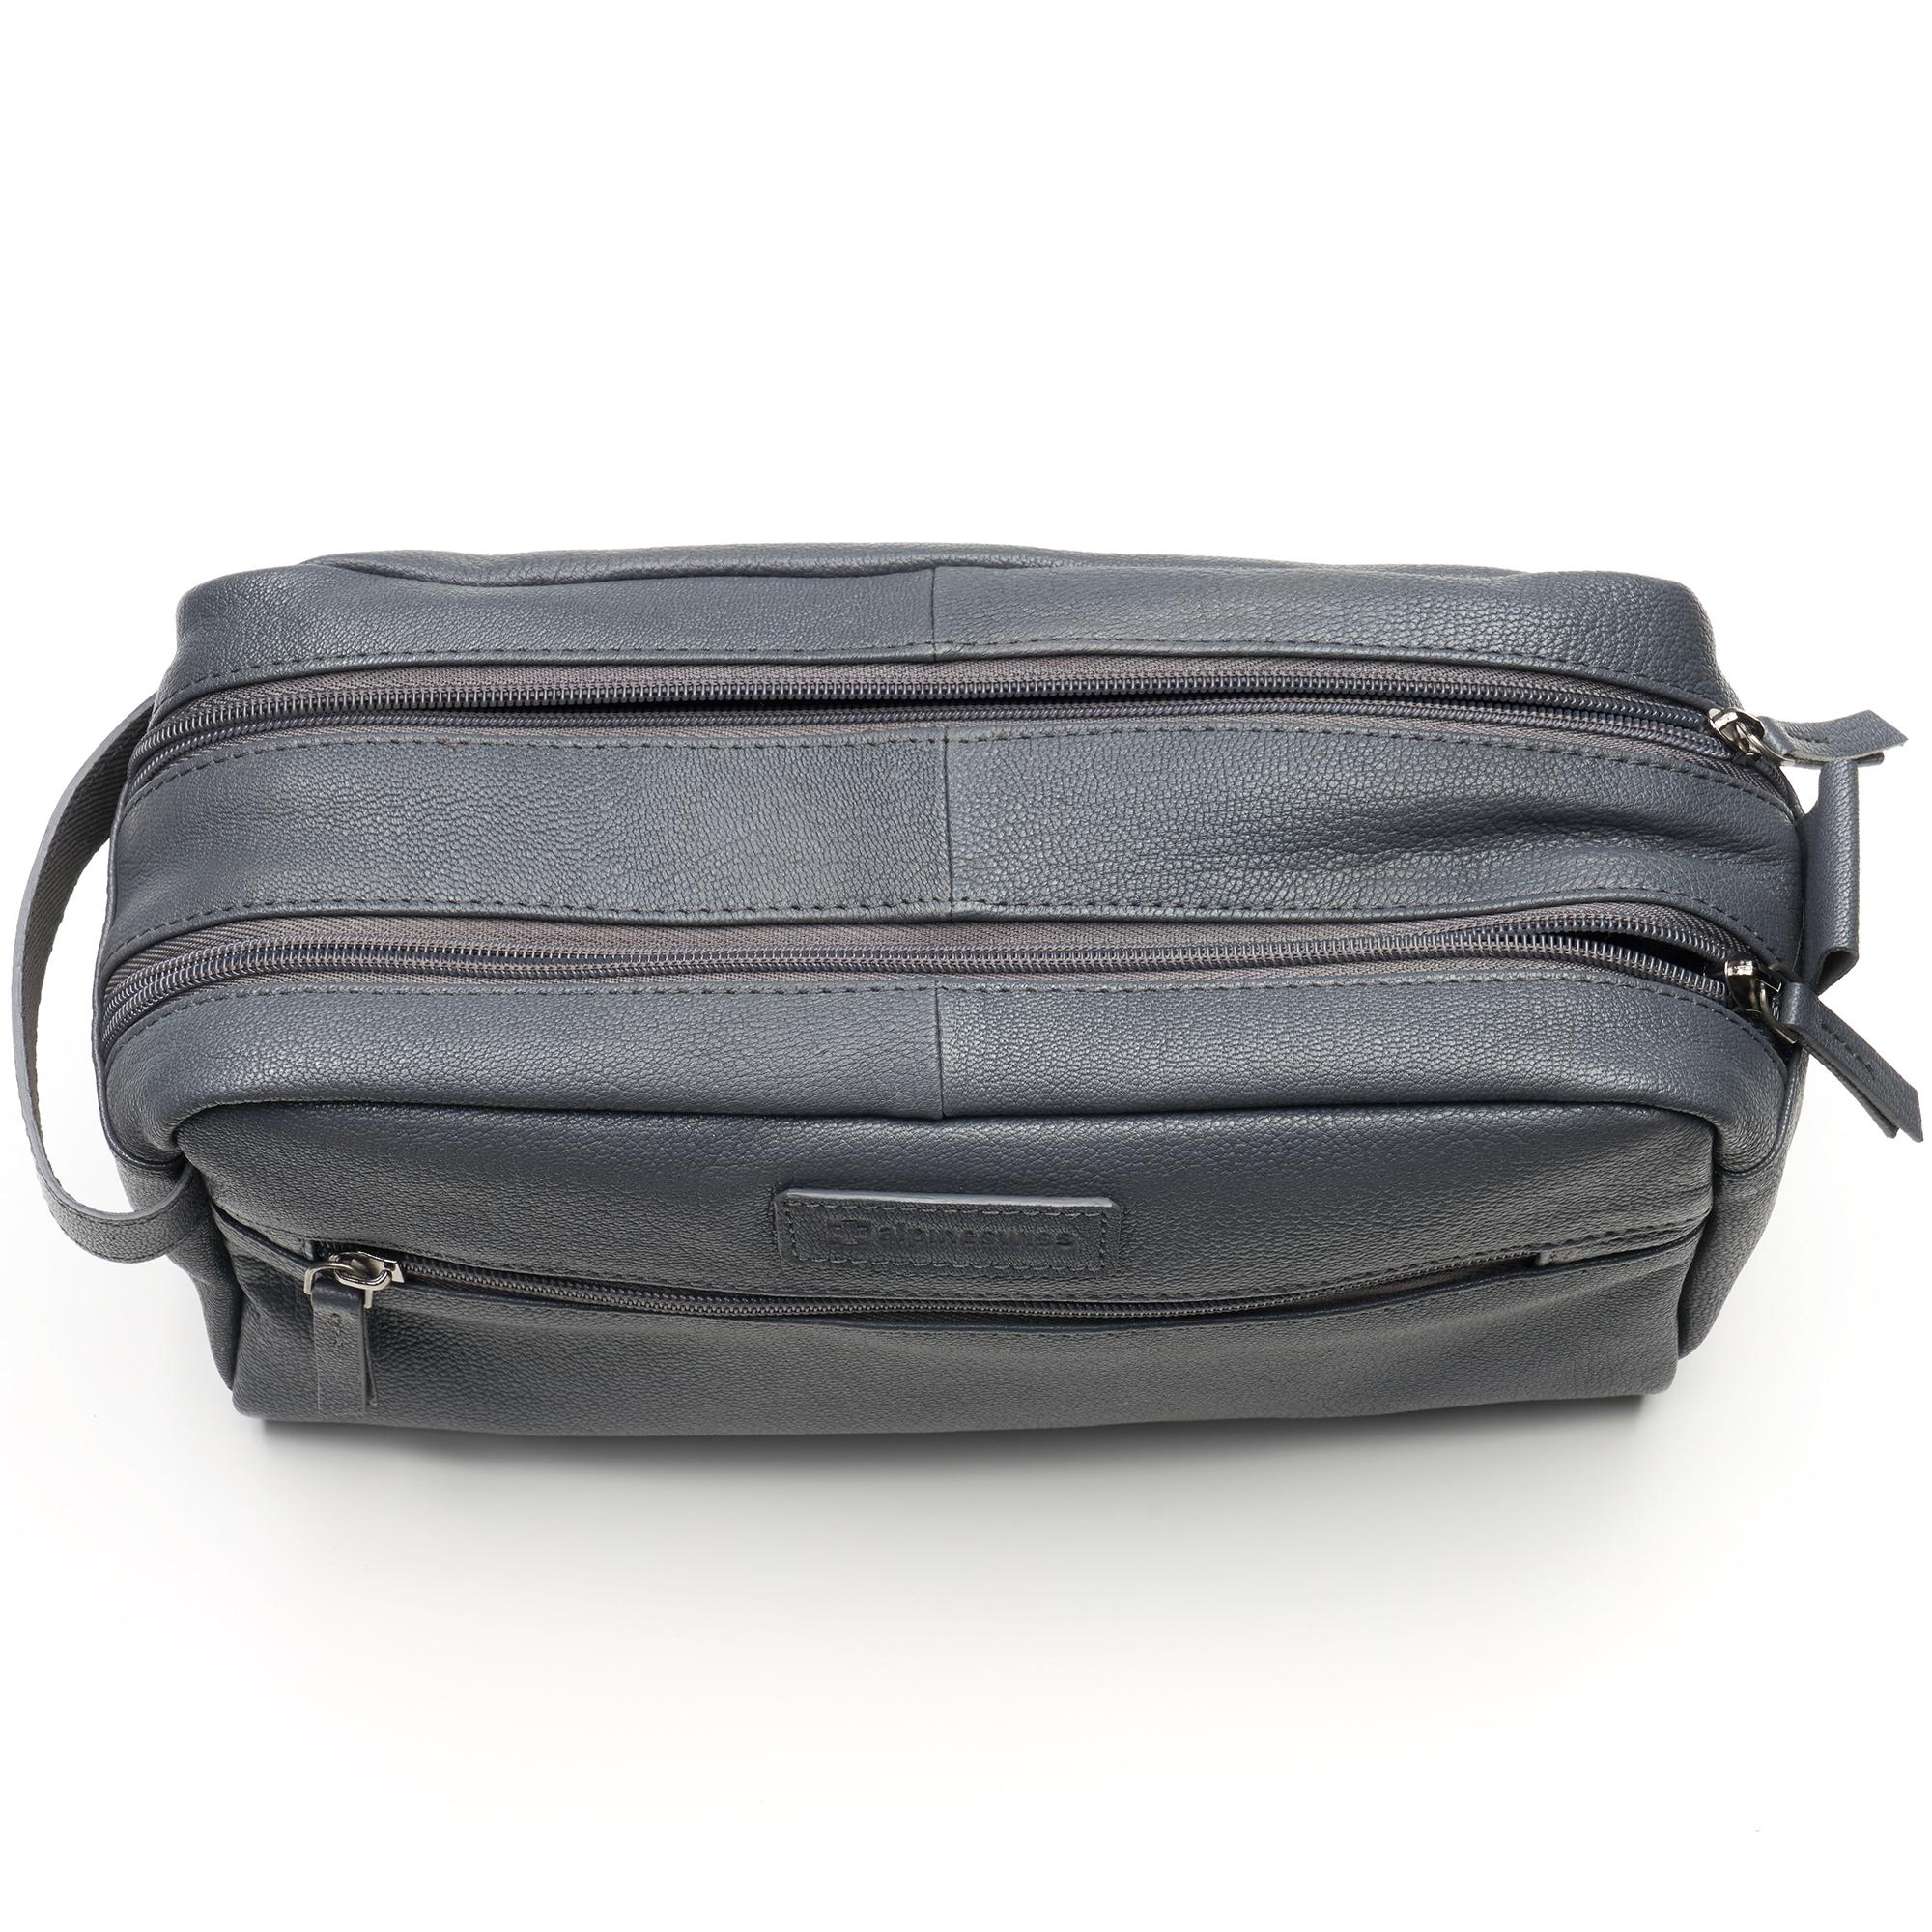 AlpineSwiss-Sedona-Toiletry-Bag-Genuine-Leather-Shaving-Kit-Dopp-Kit-Travel-Case thumbnail 30